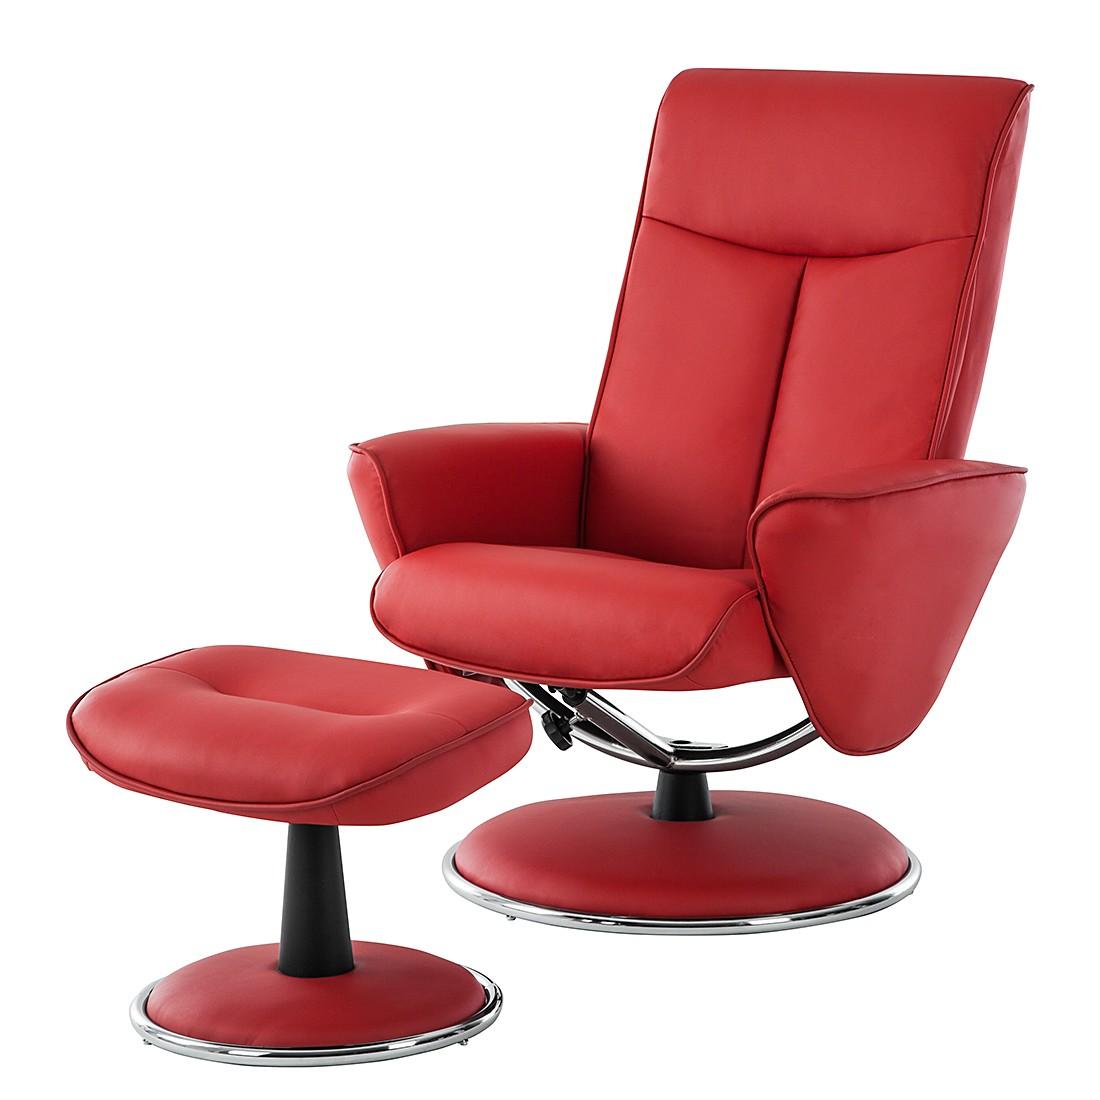 Relaxsessel Kenzo (mit Hocker) – Kunstleder Rot, Nuovoform online bestellen